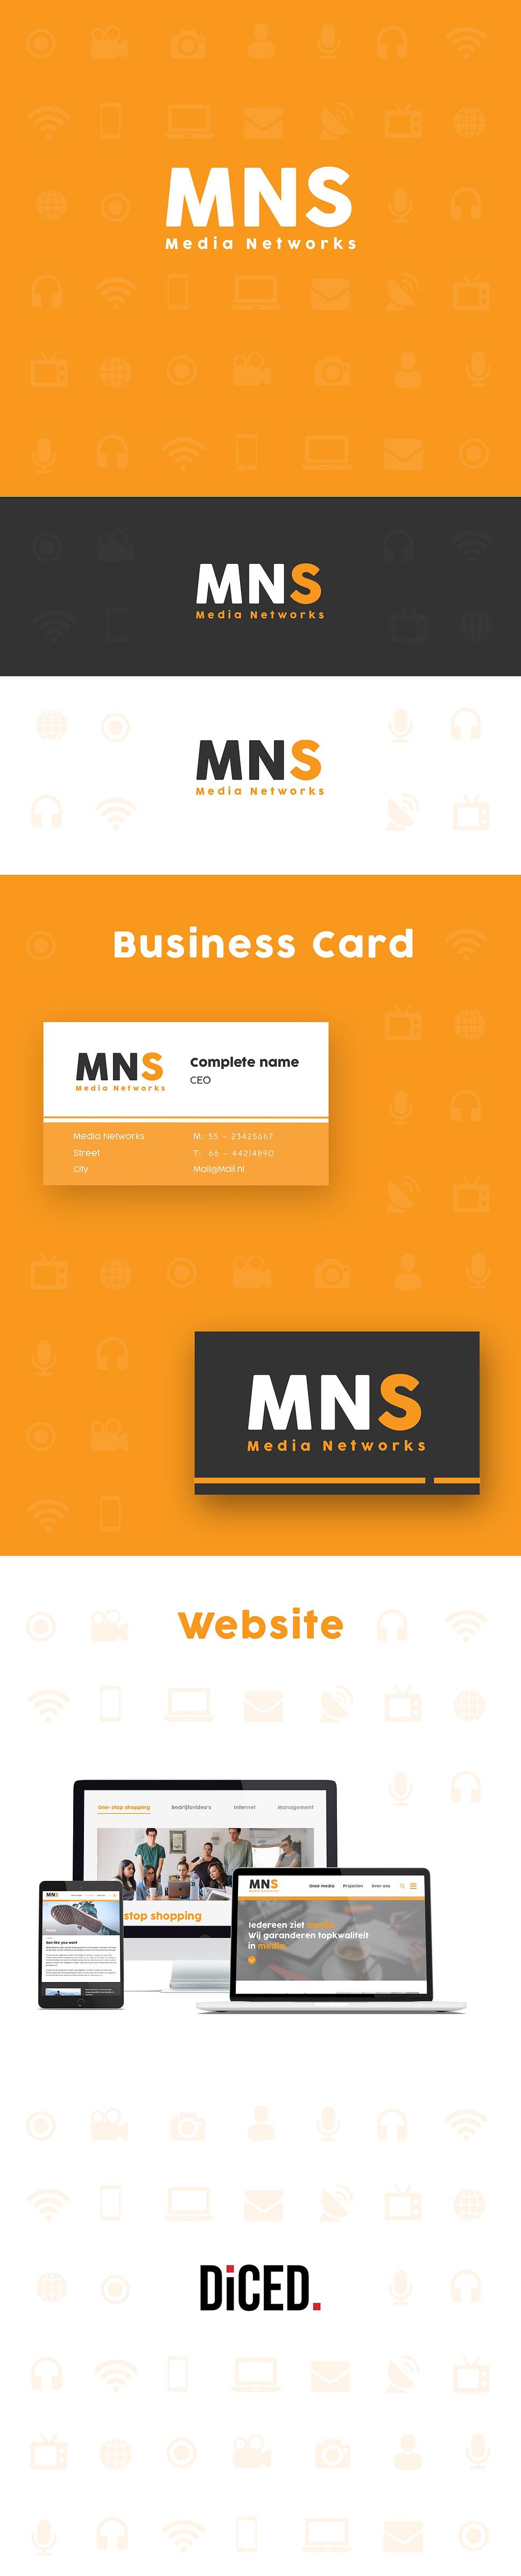 MNS-behance.jpg